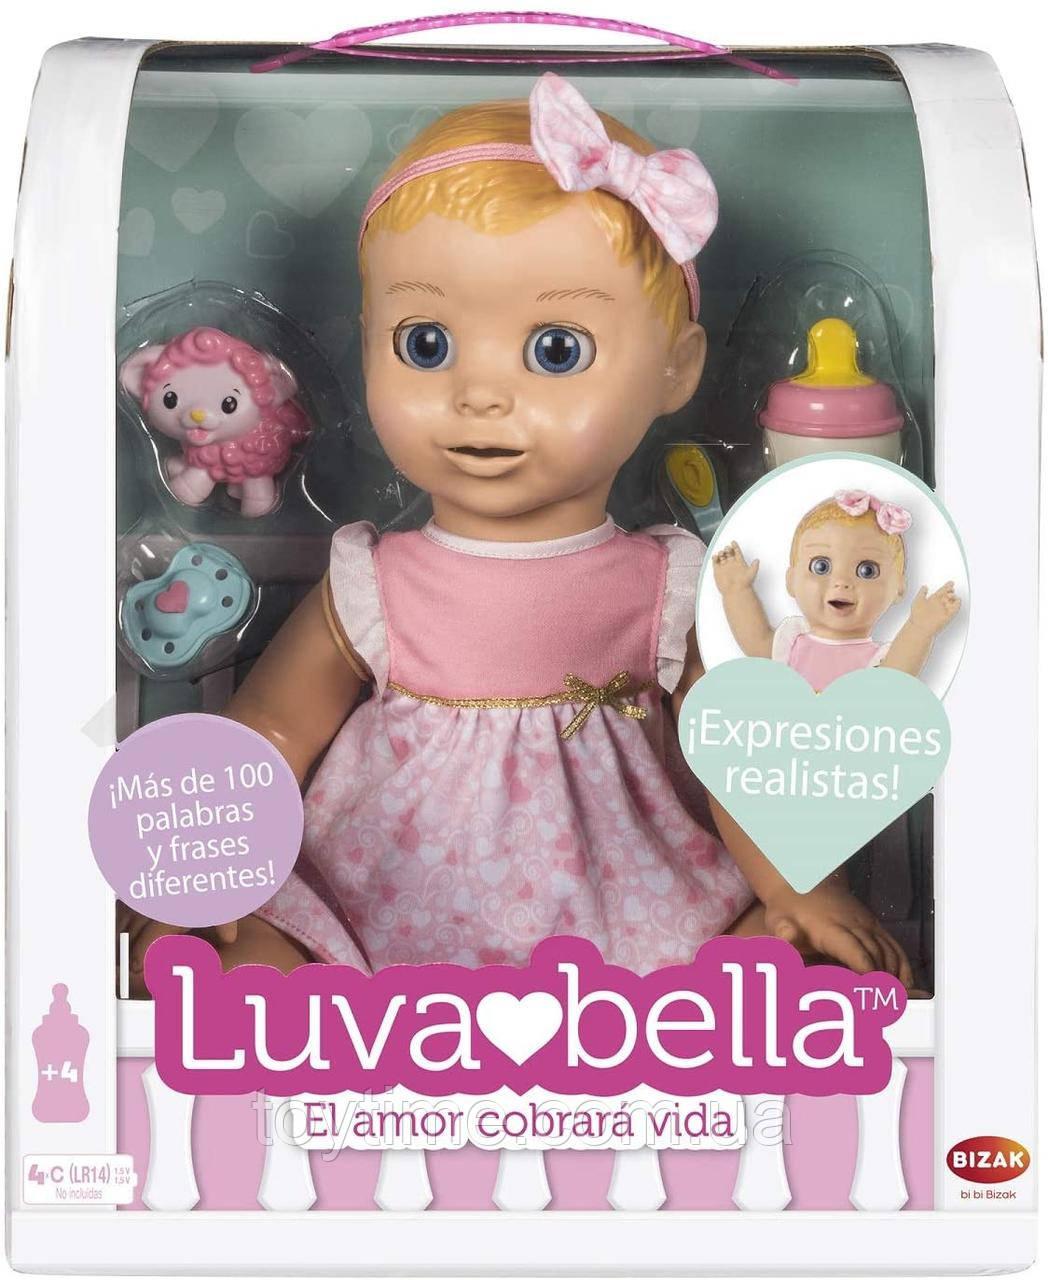 Интерактивная кукла Spin Master Luvabella (испанский) / Лувабелла Blonde Hair Interactive Baby Doll (Spain)